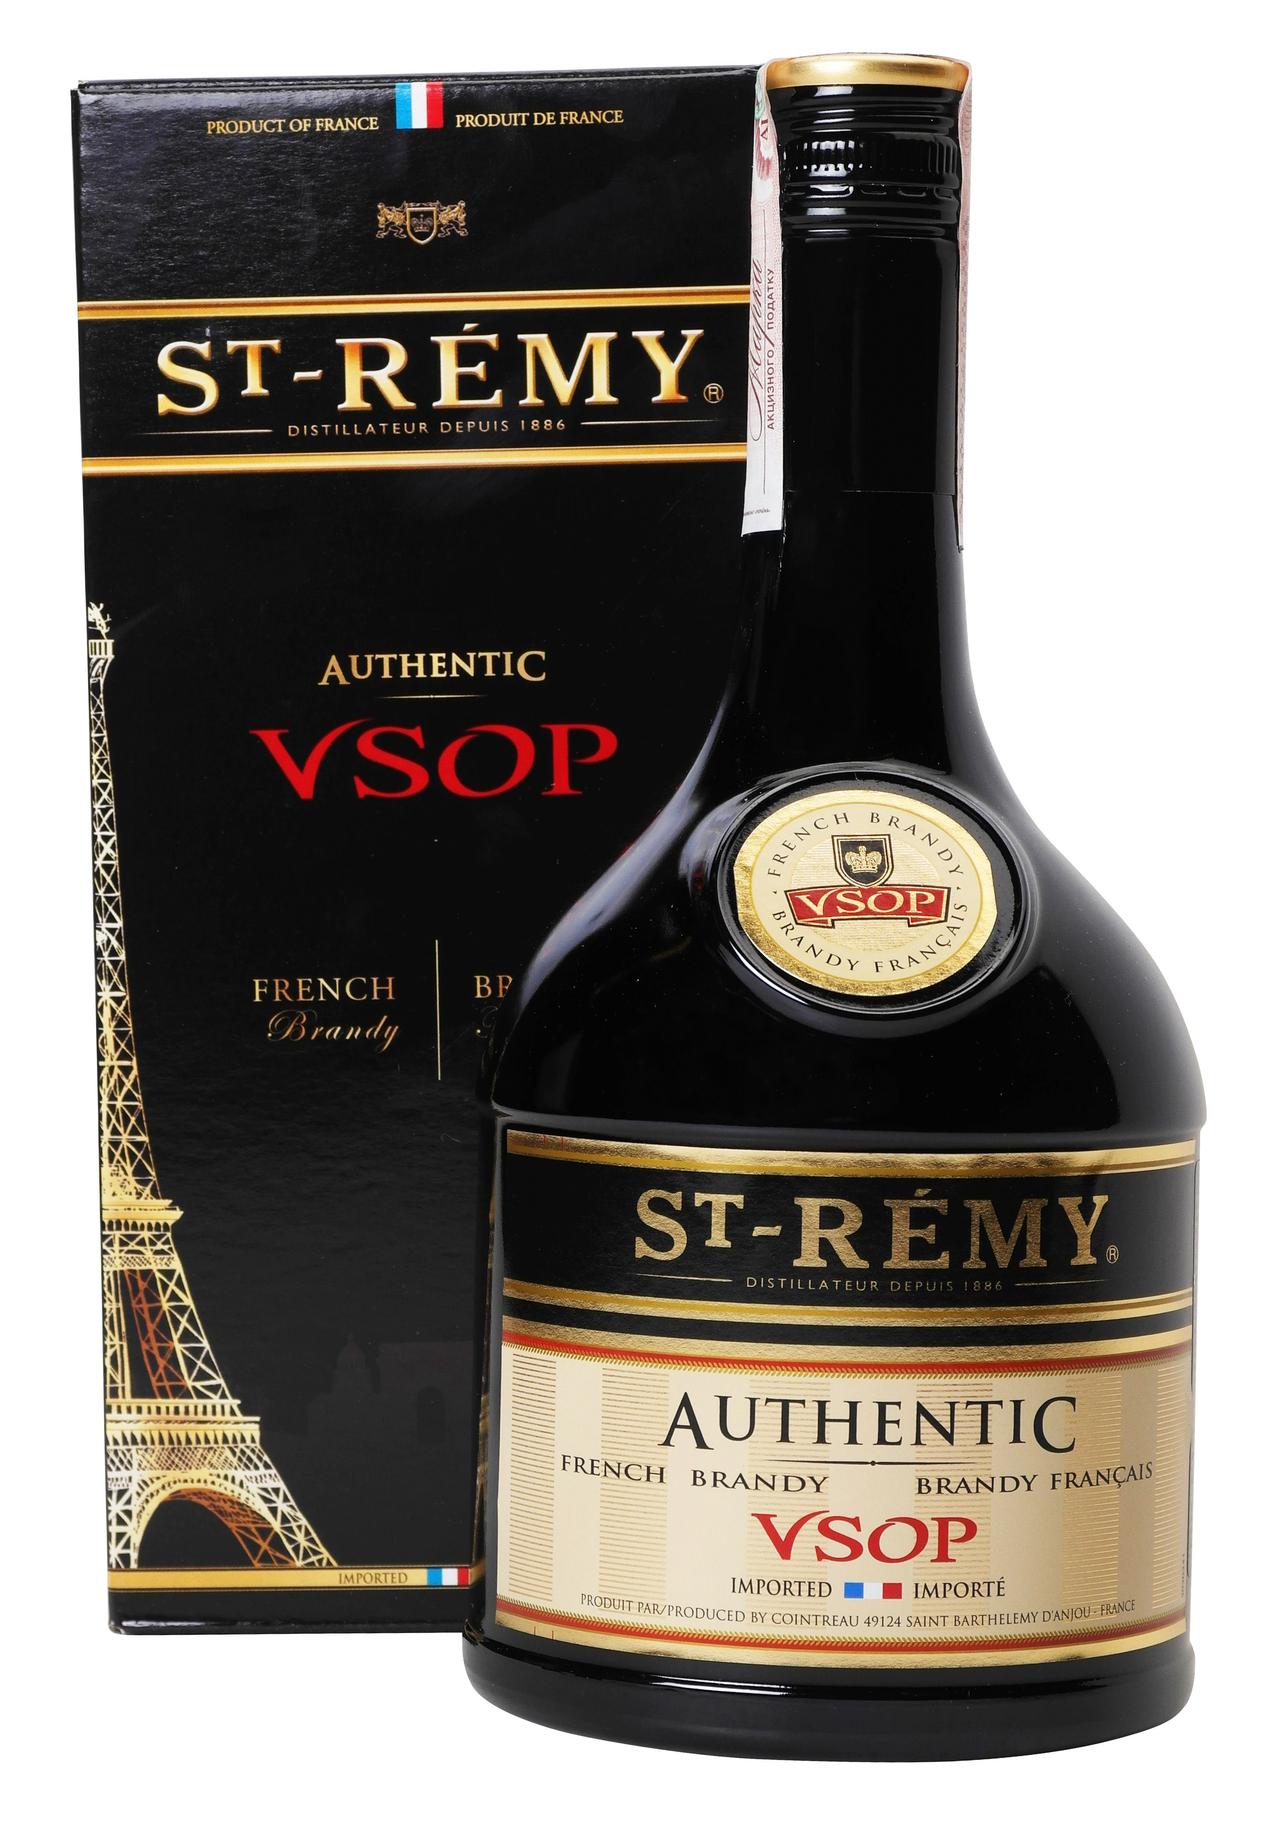 St-rémy (бренди) — циклопедия